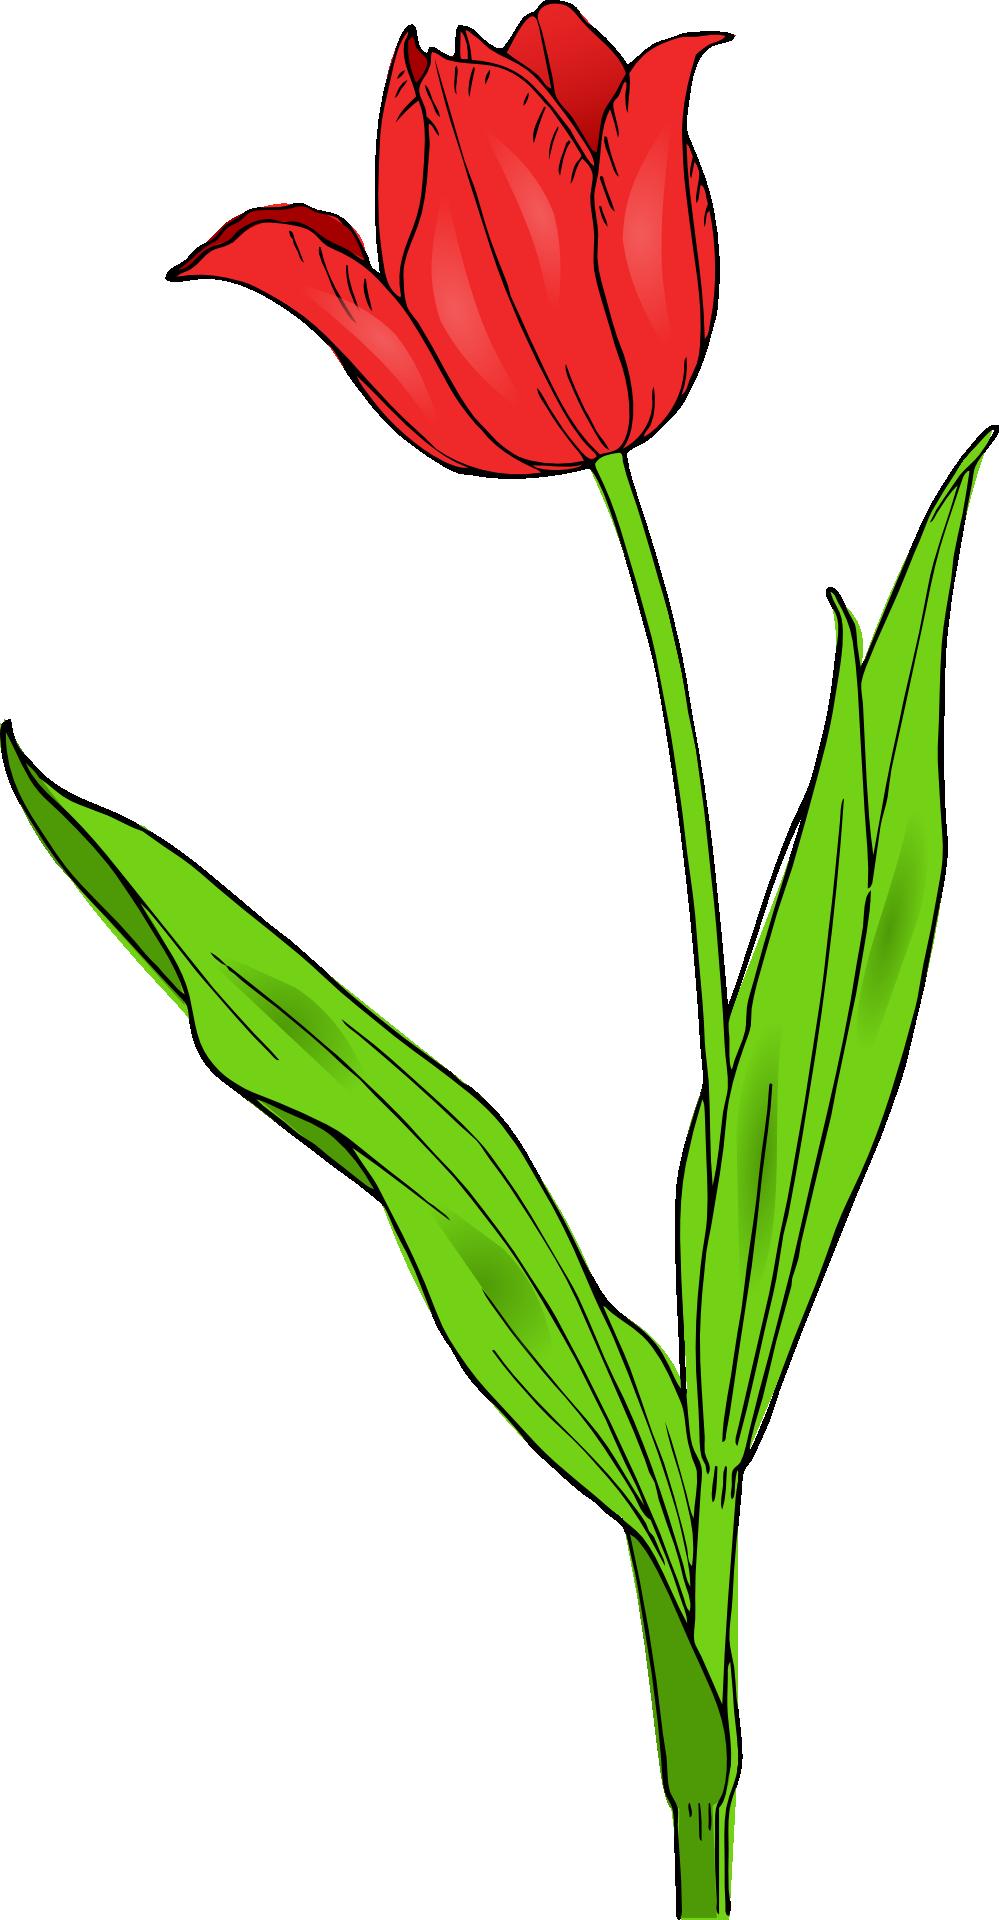 image transparent stock Tulip Spring Flower